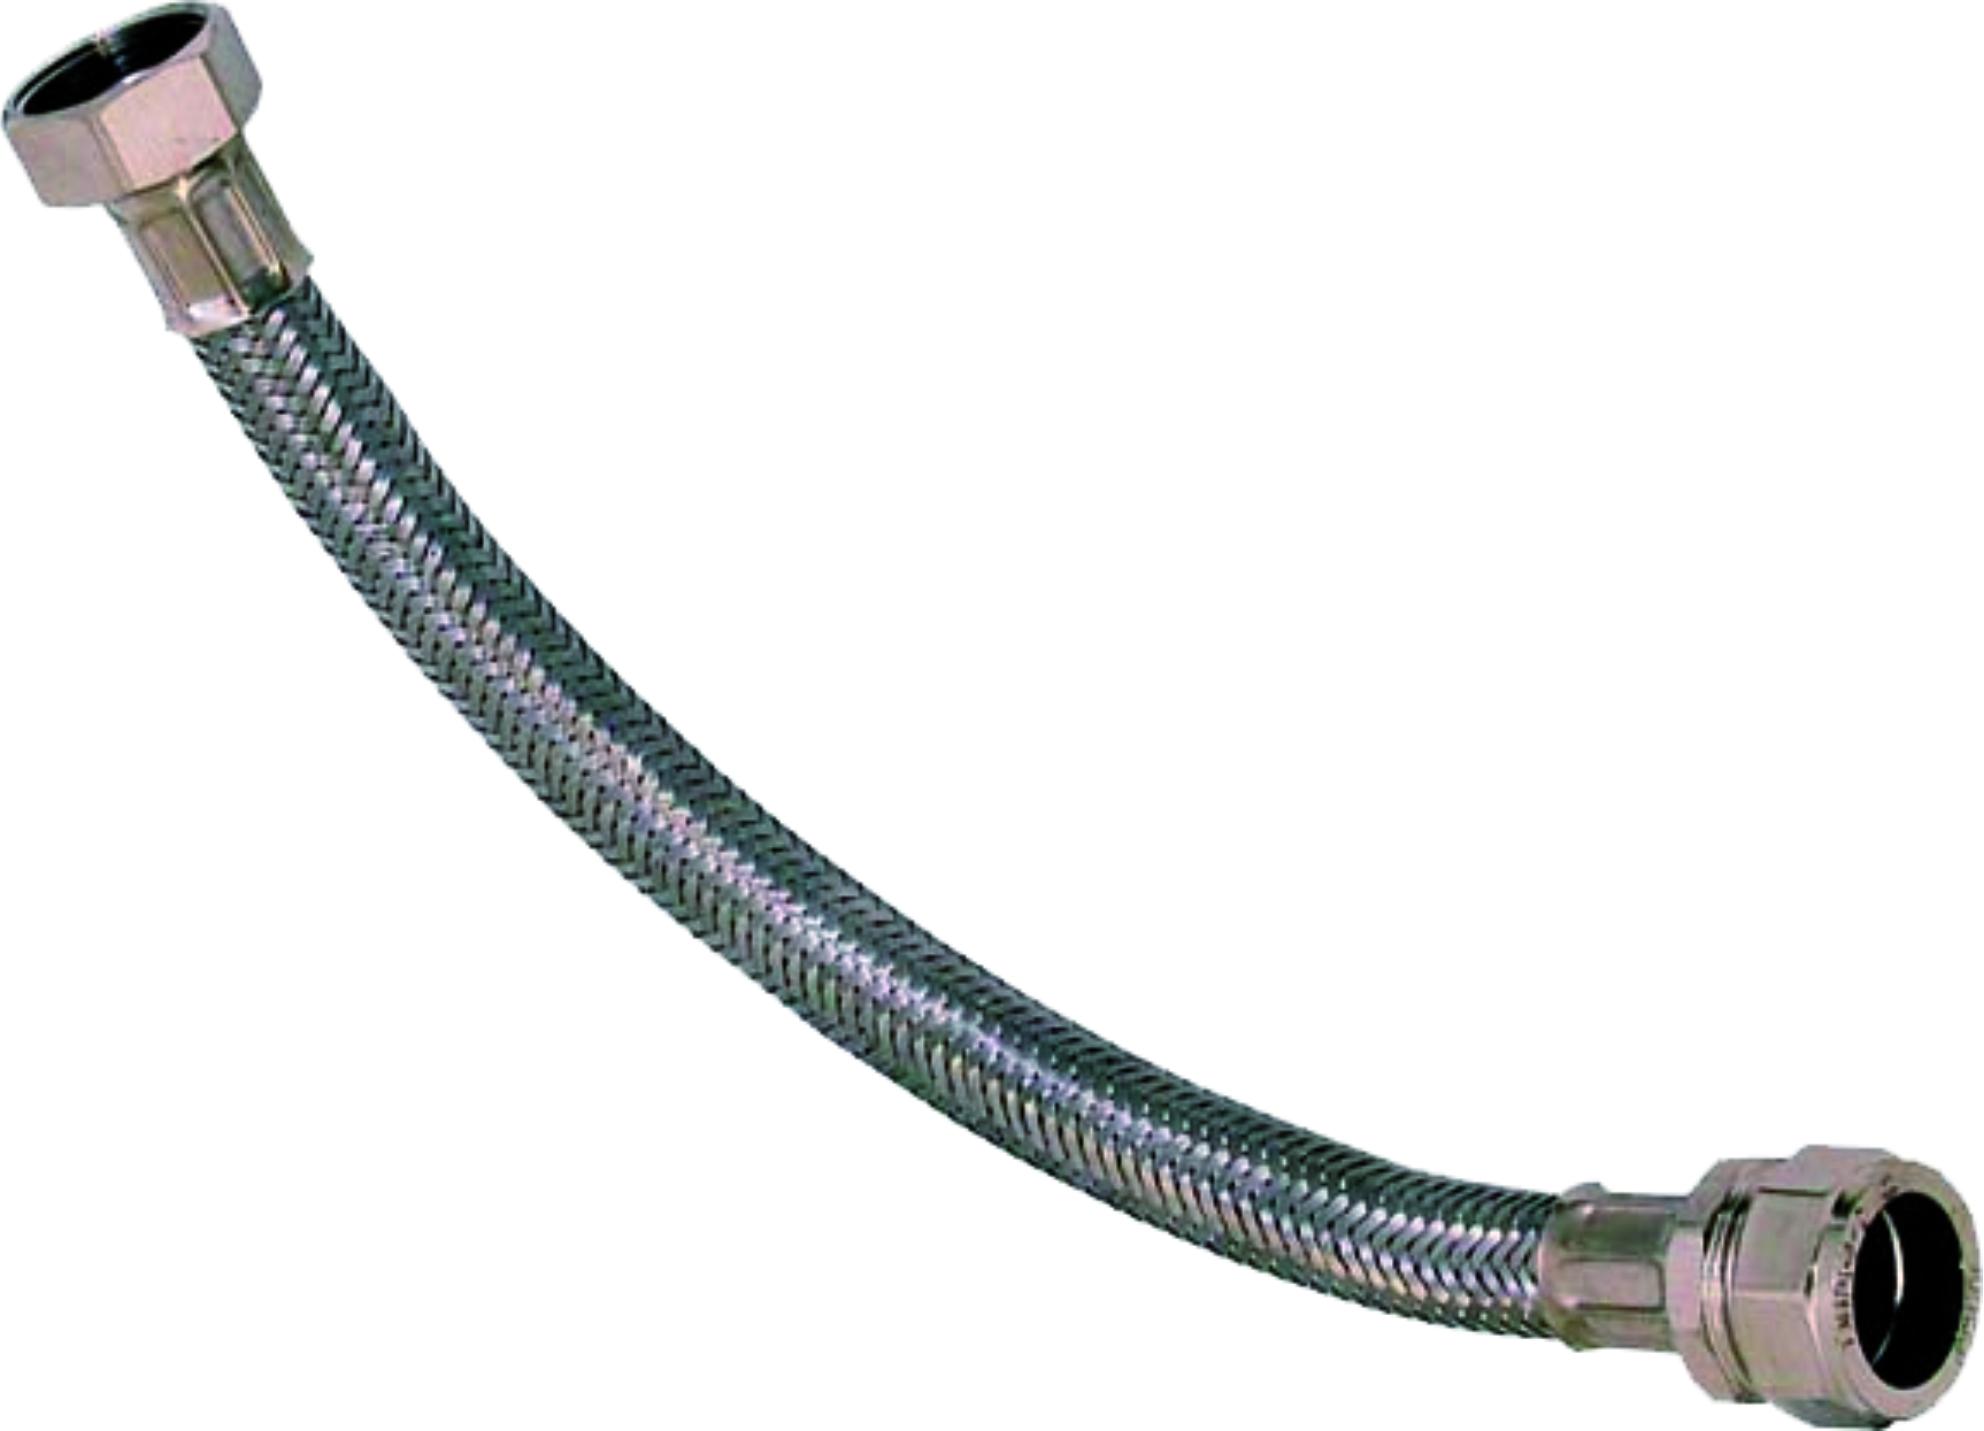 Flexible hose coupling small compost bin